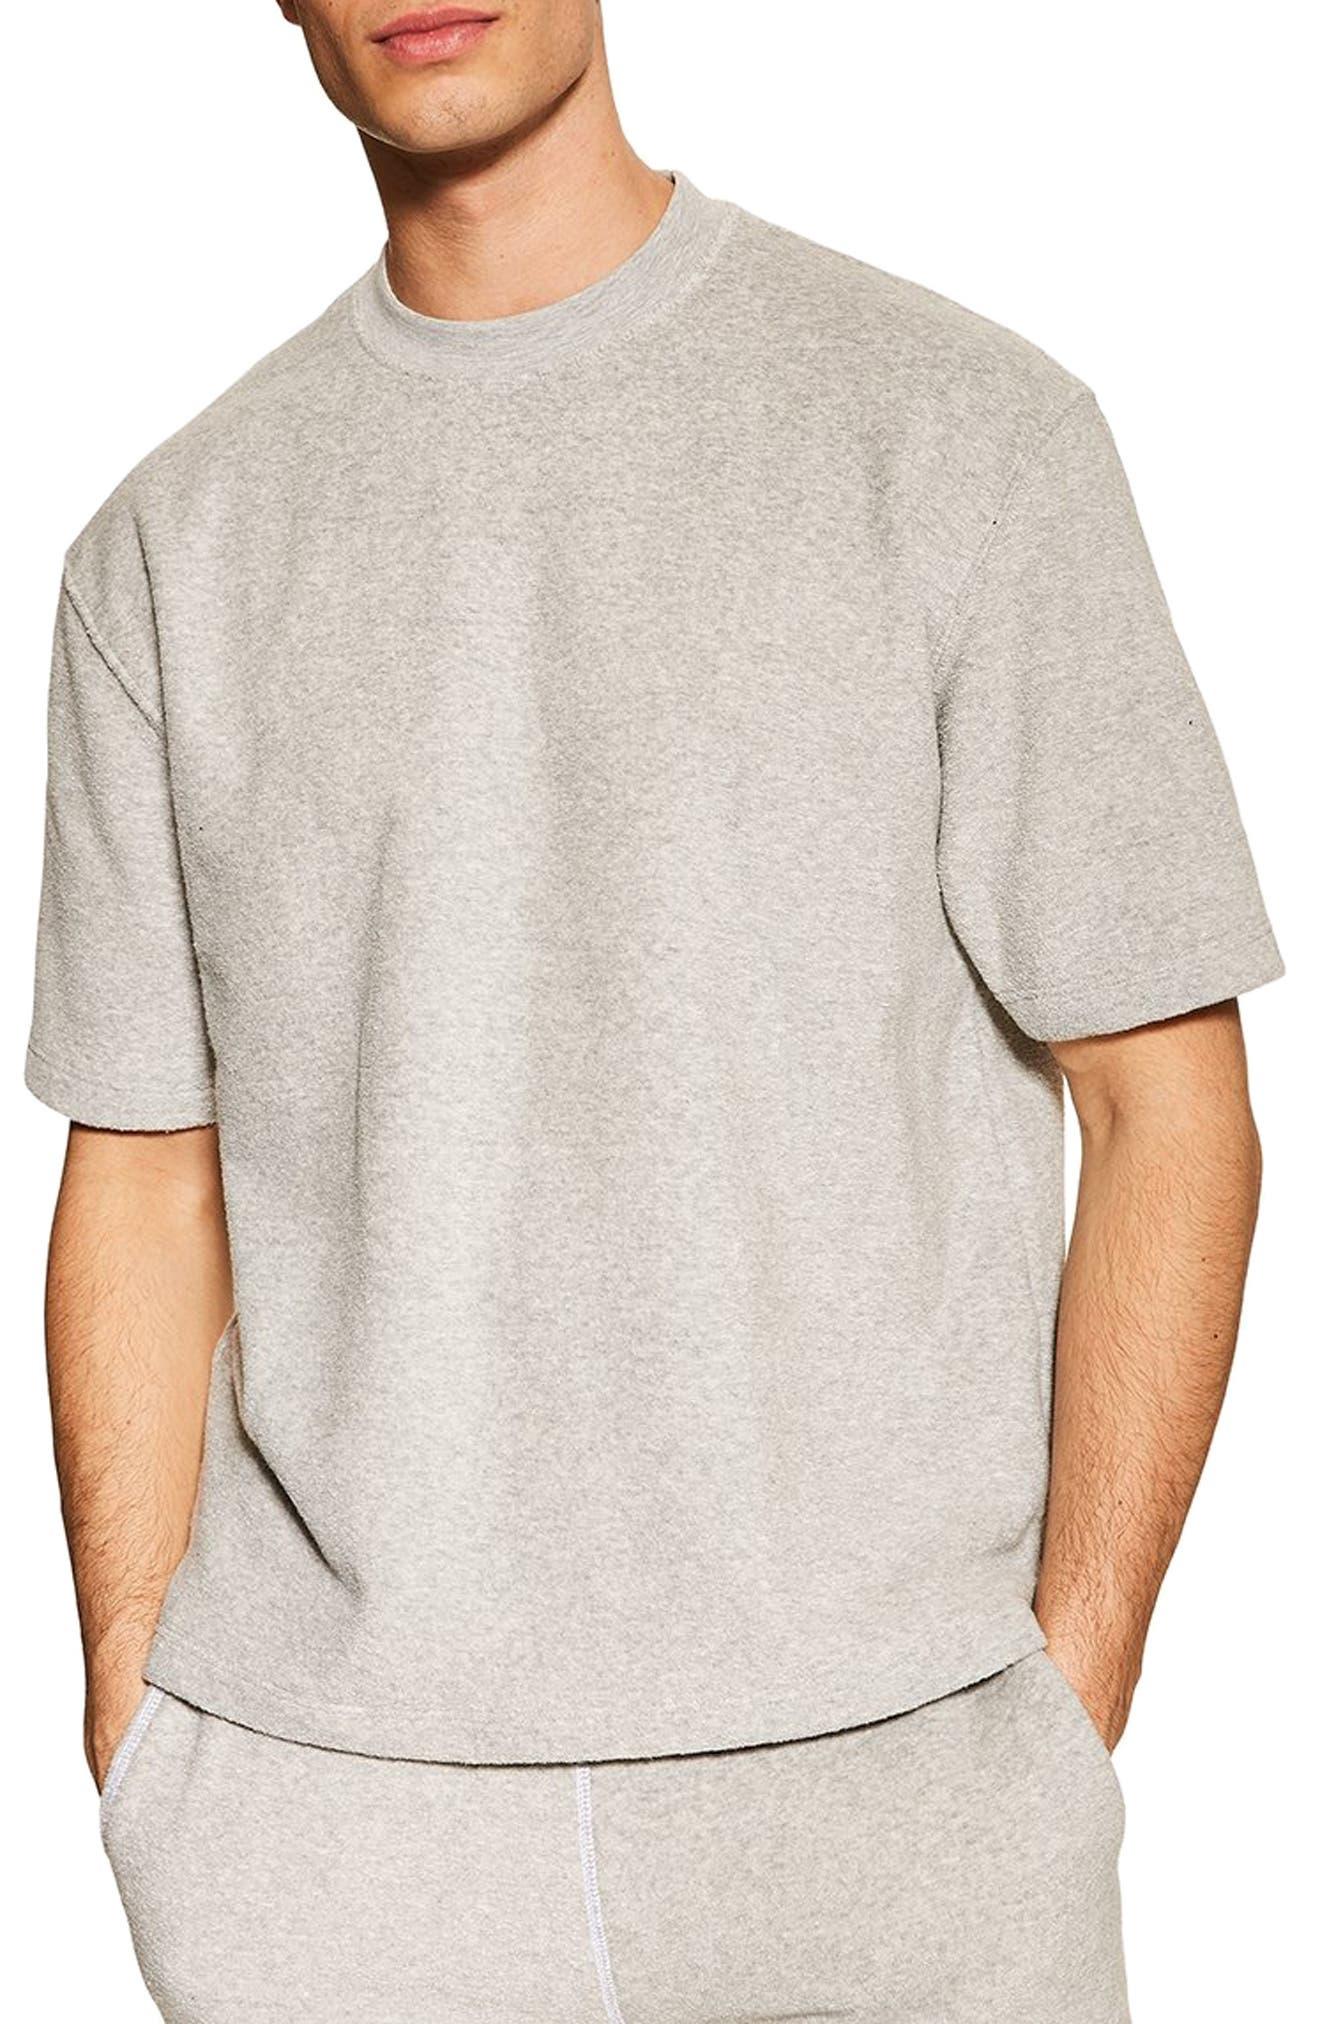 TOPMAN Short Sleeve Terry Sweatshirt, Main, color, GREY